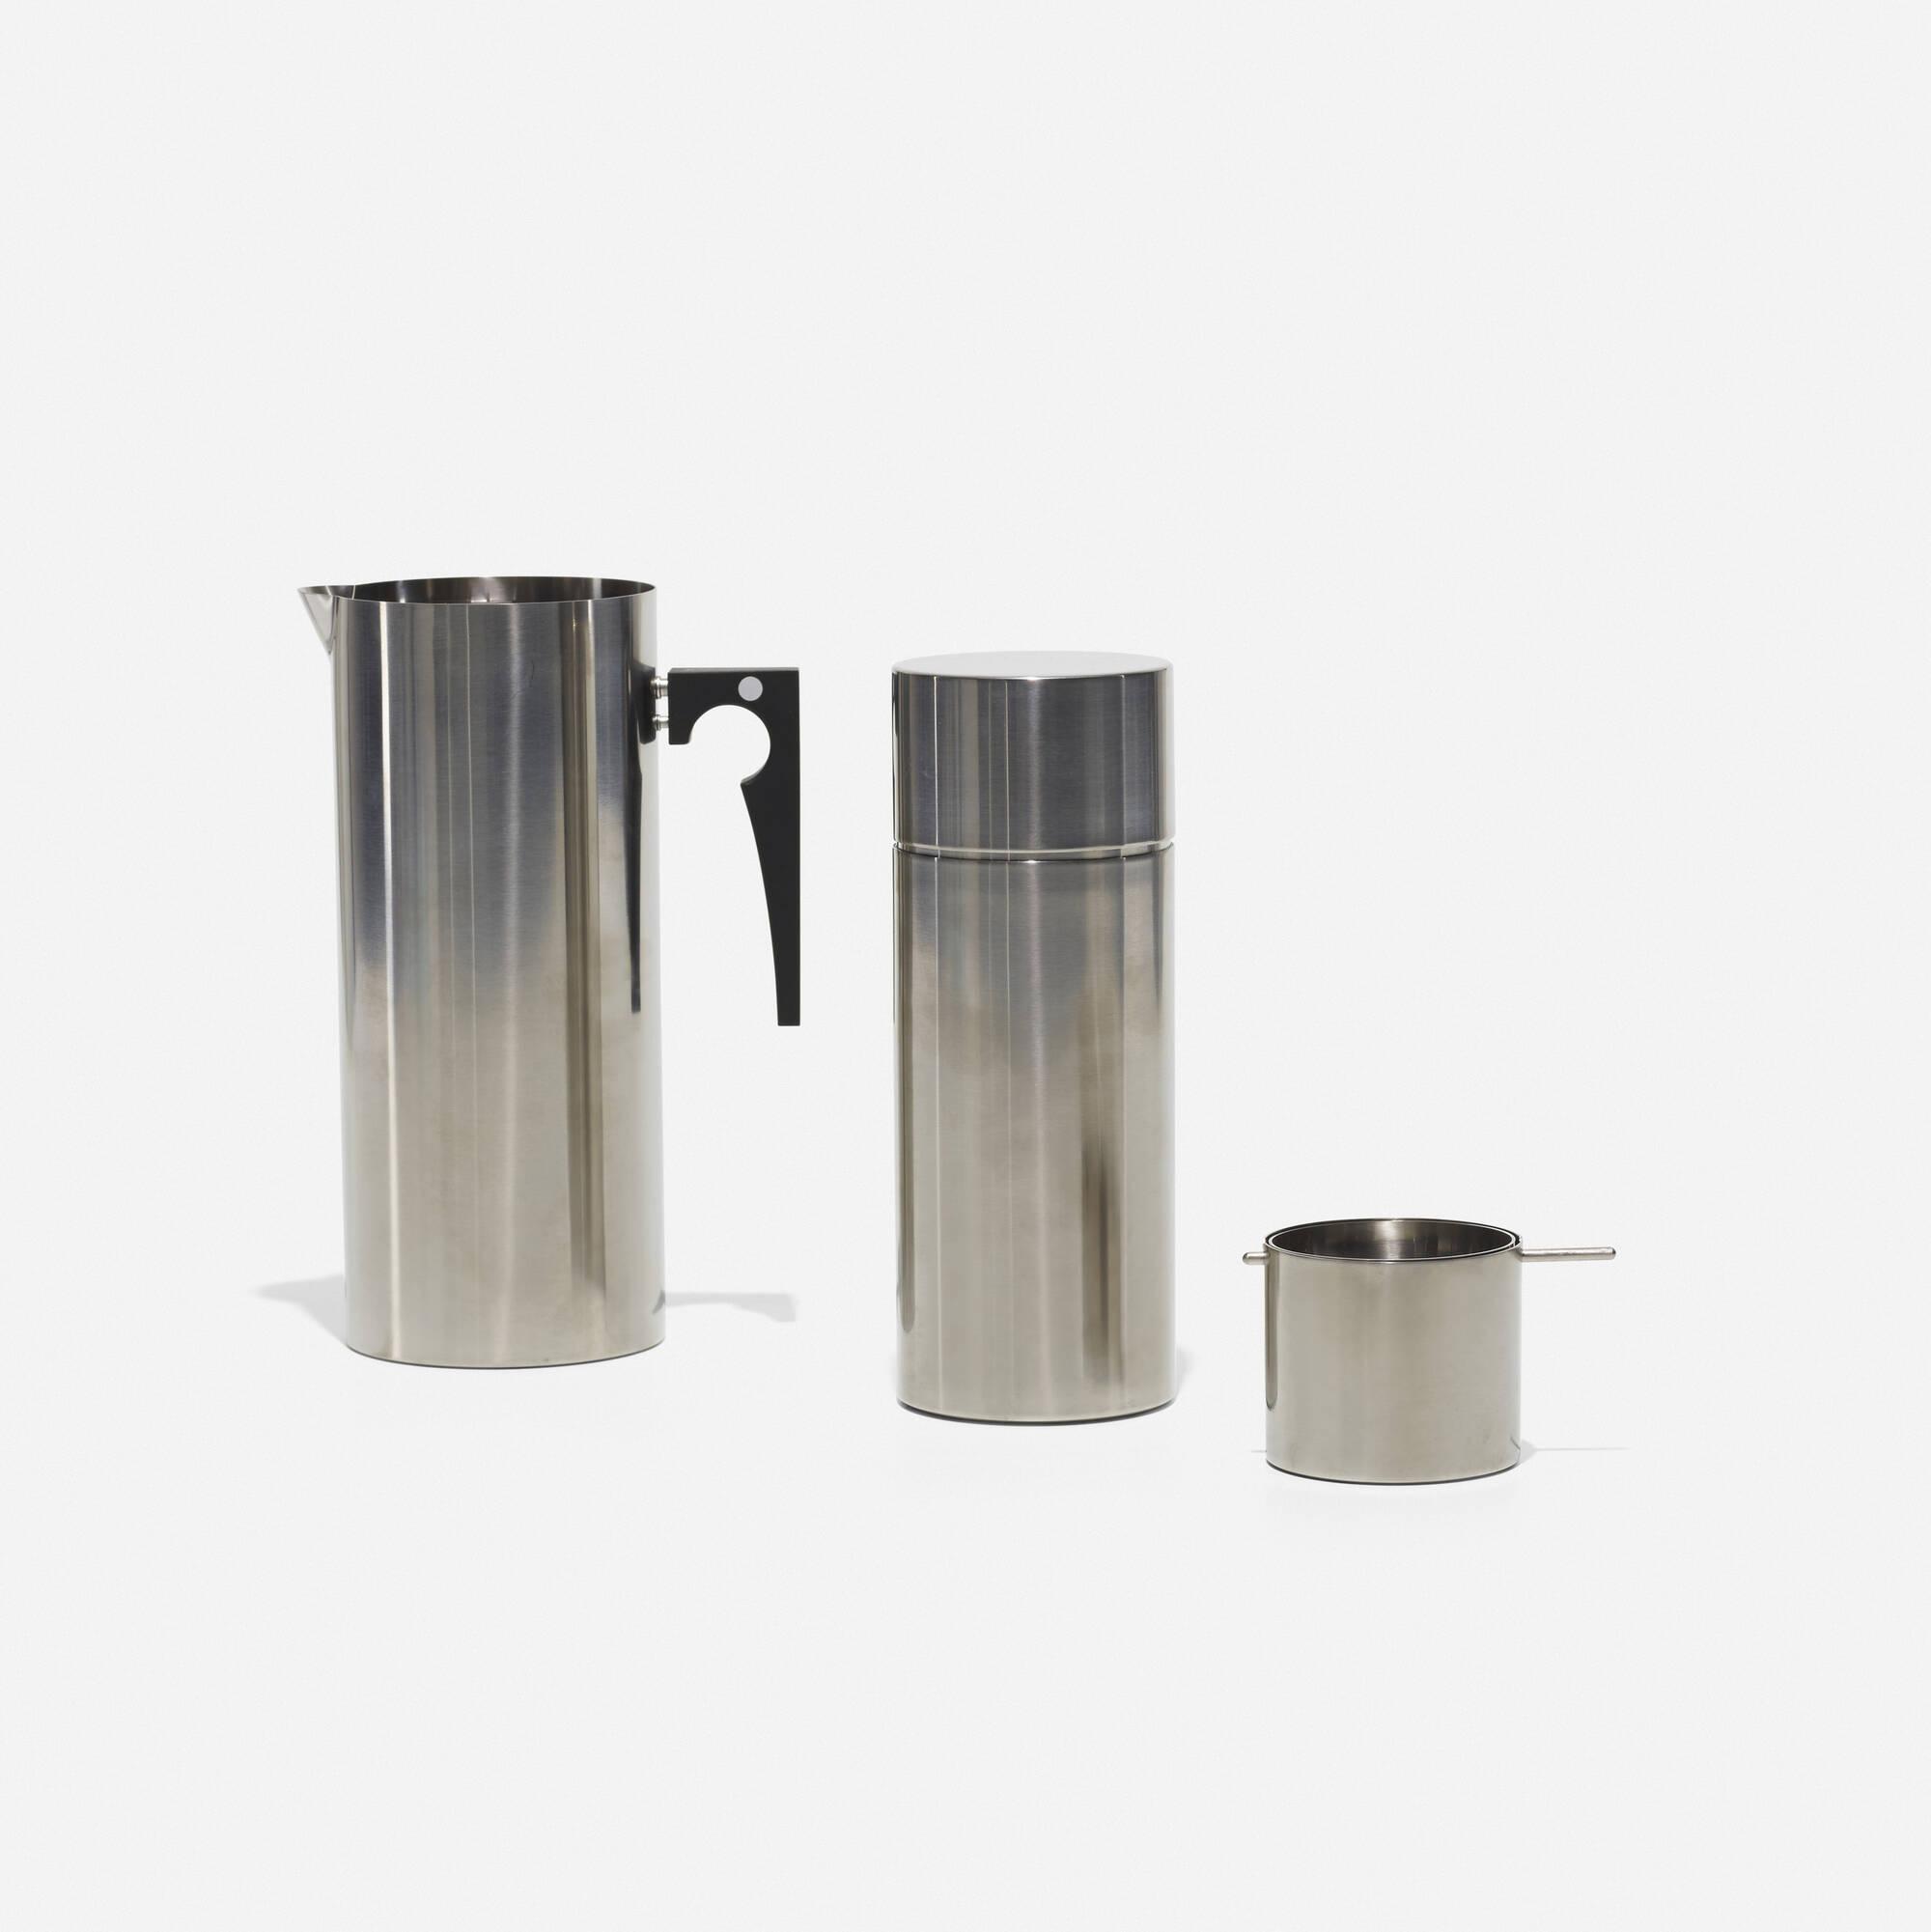 475: Arne Jacobsen / Cylinda bar service (2 of 2)